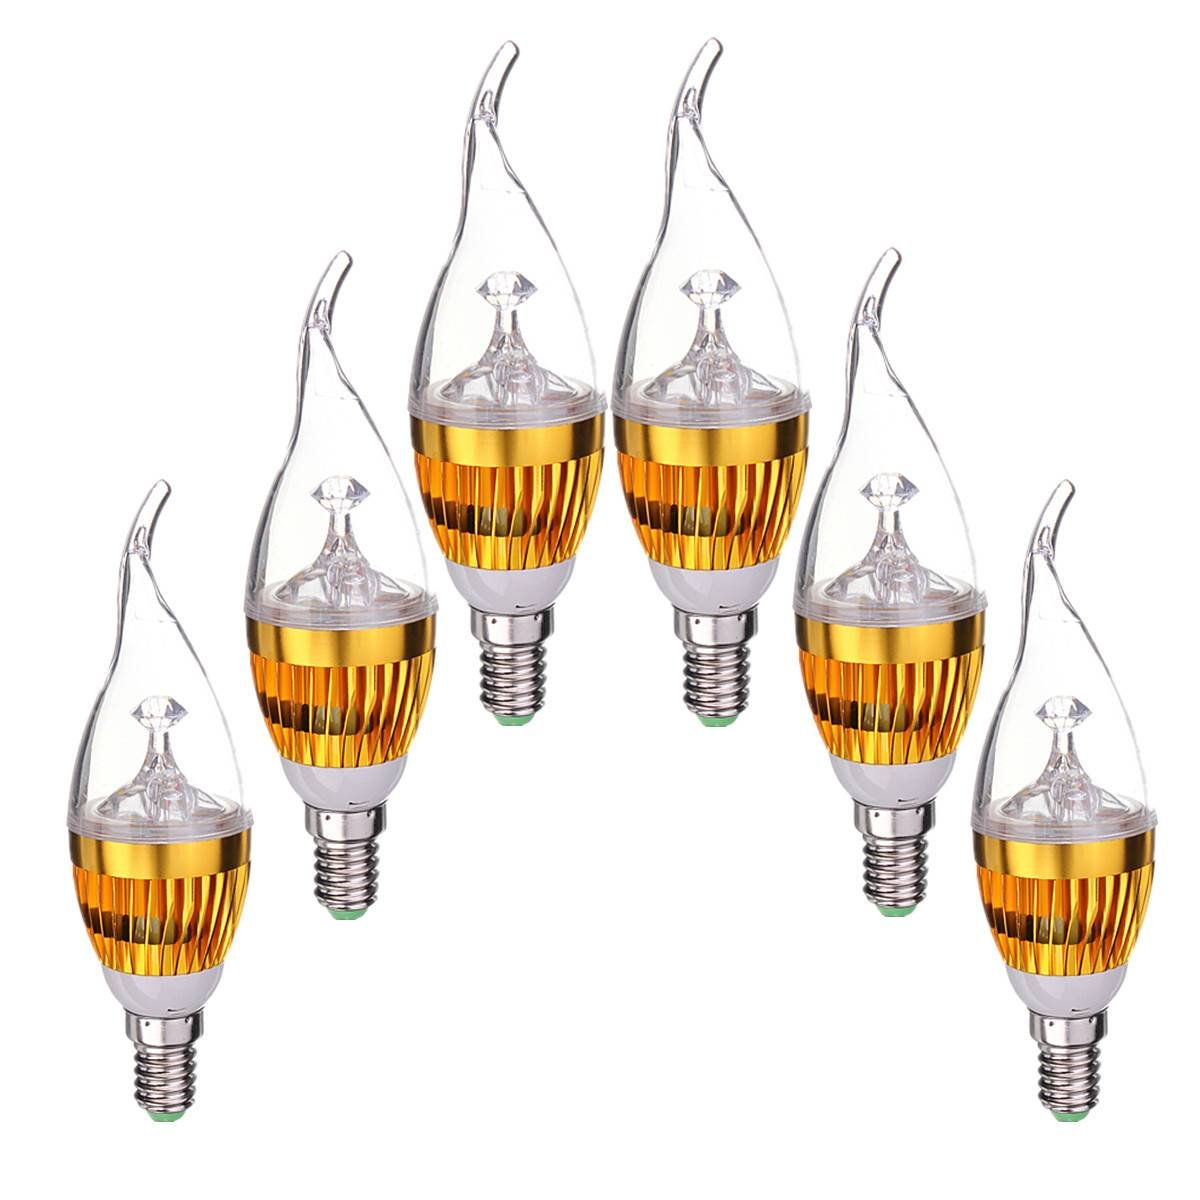 Kit 6 lampade led candela e14 dimmerabile 3w bianco freddo for Costo lampada